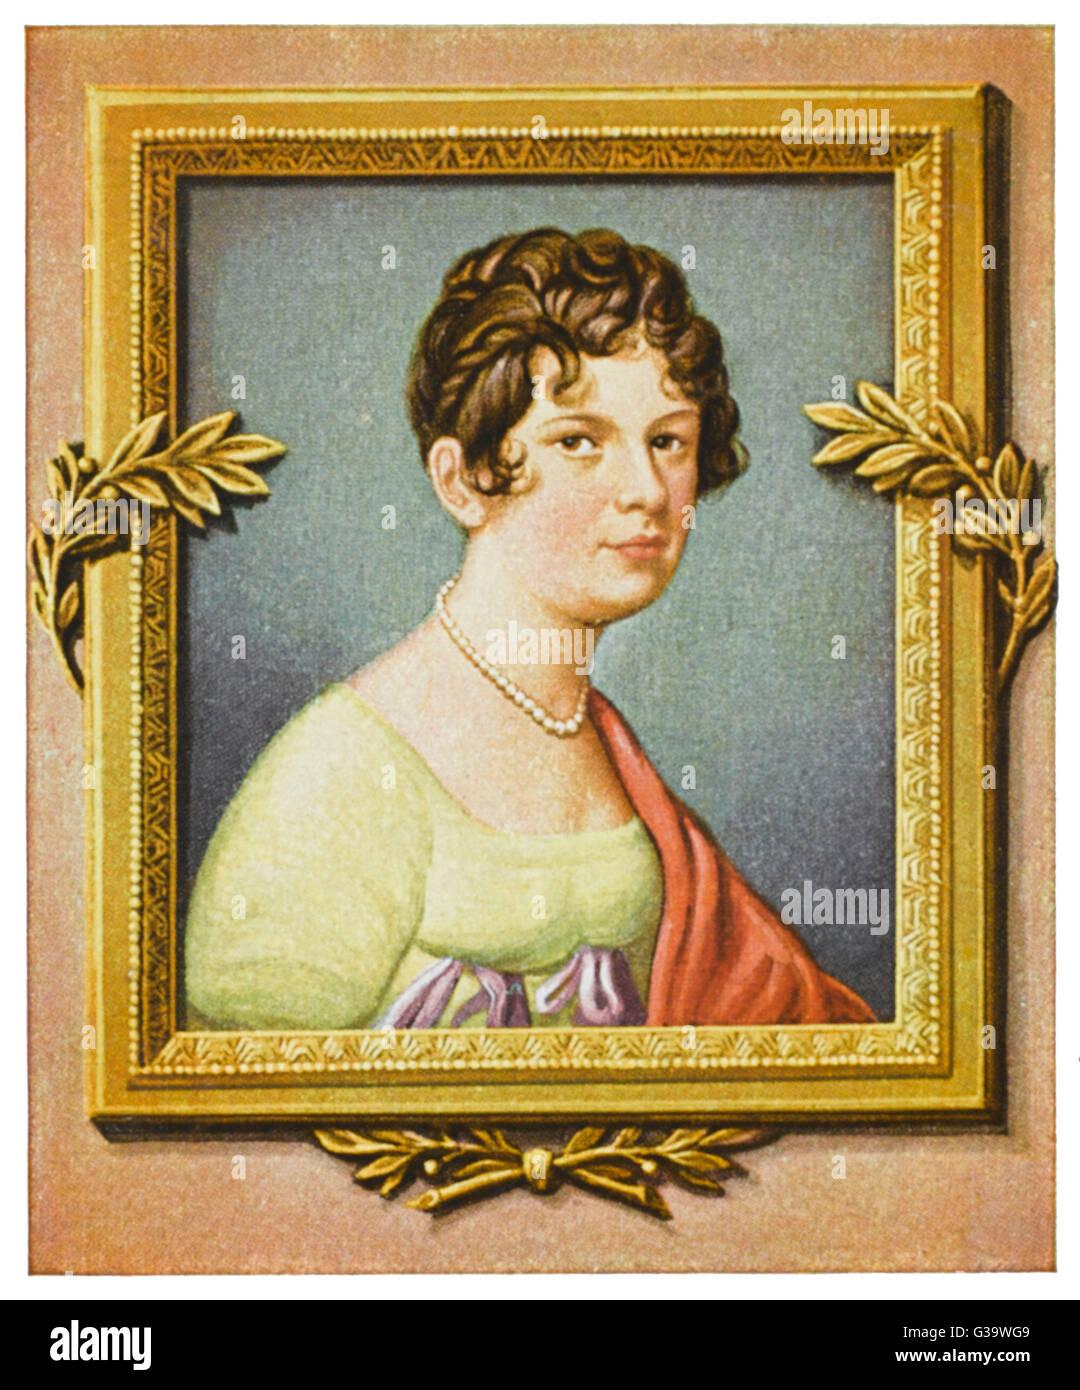 MADAME DE LEFEBVRE  Duchess of Danzig, French social leader       Date: 1759 - 1835 - Stock Image